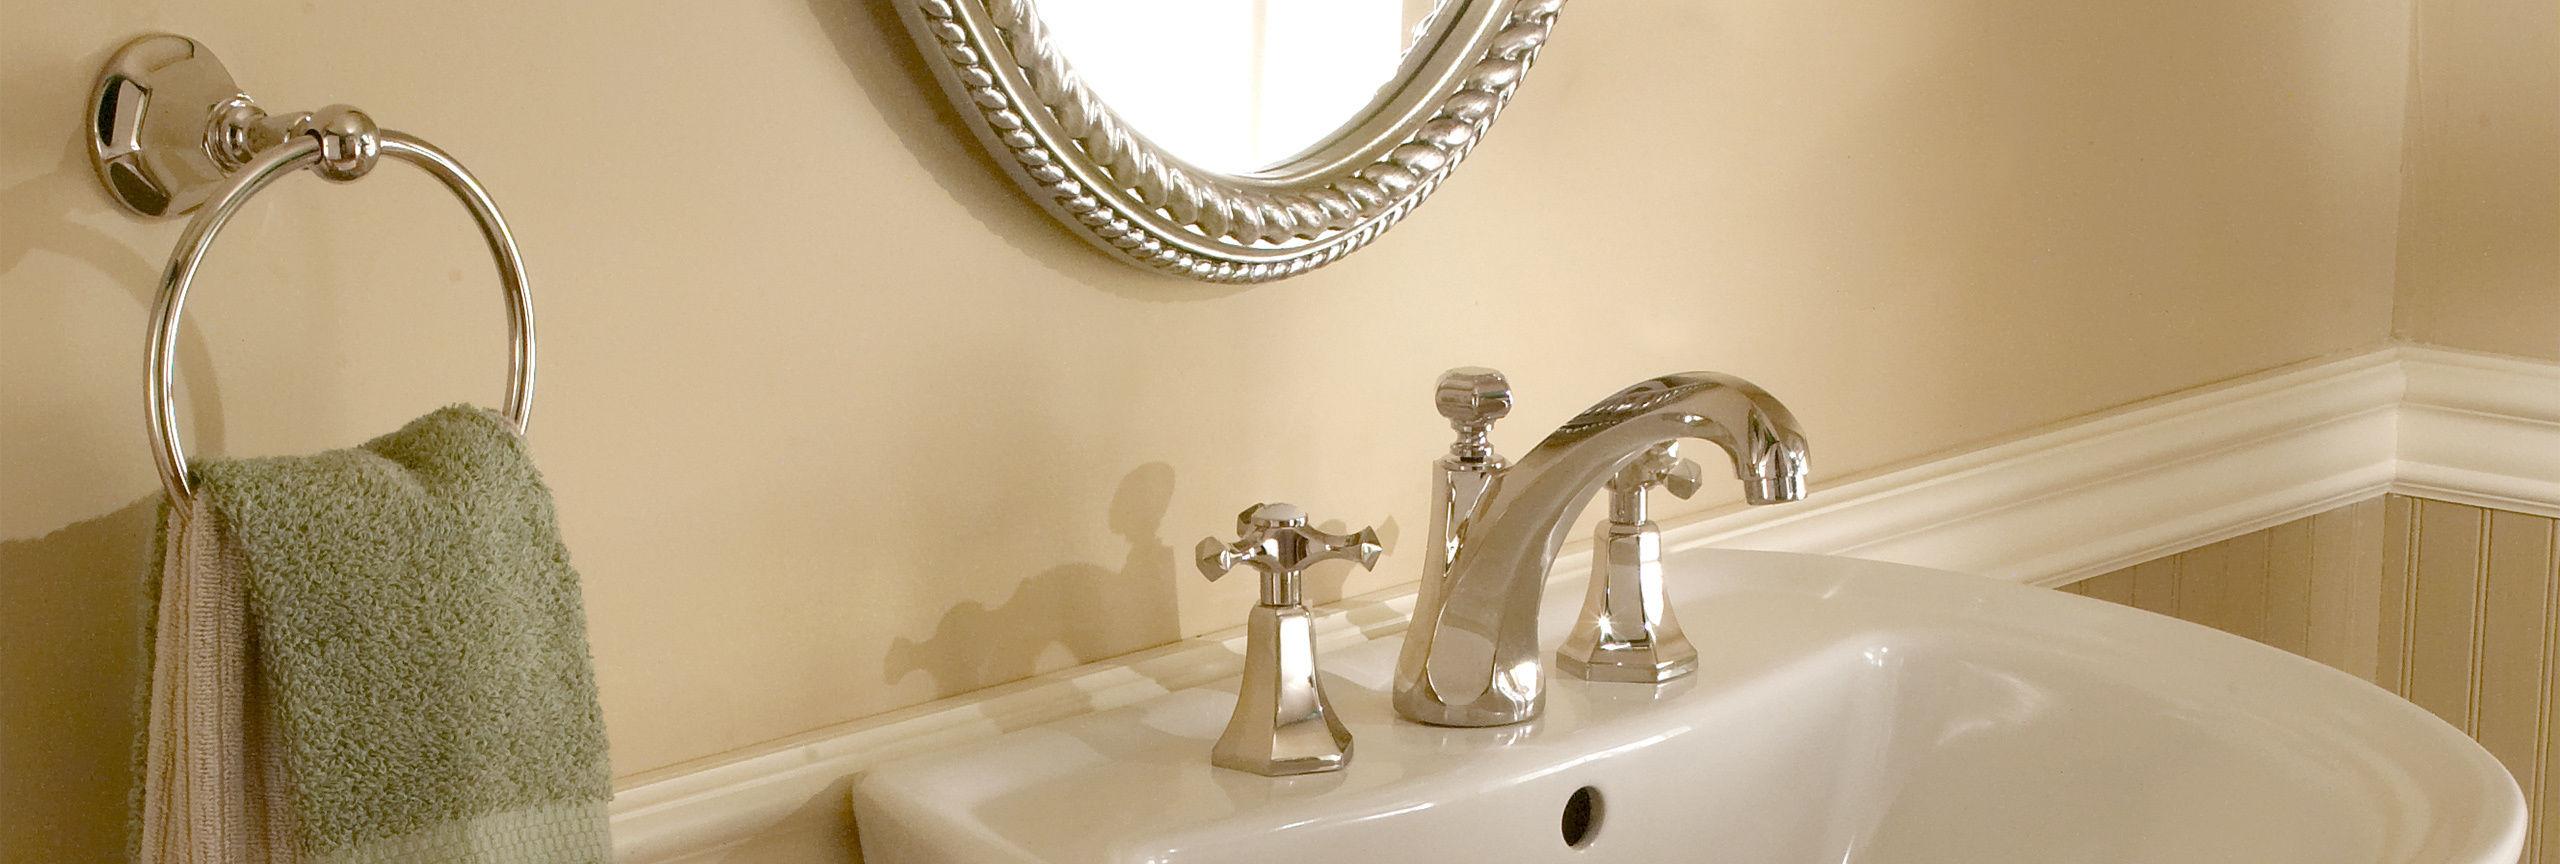 Bathroom Series Catalina - 63